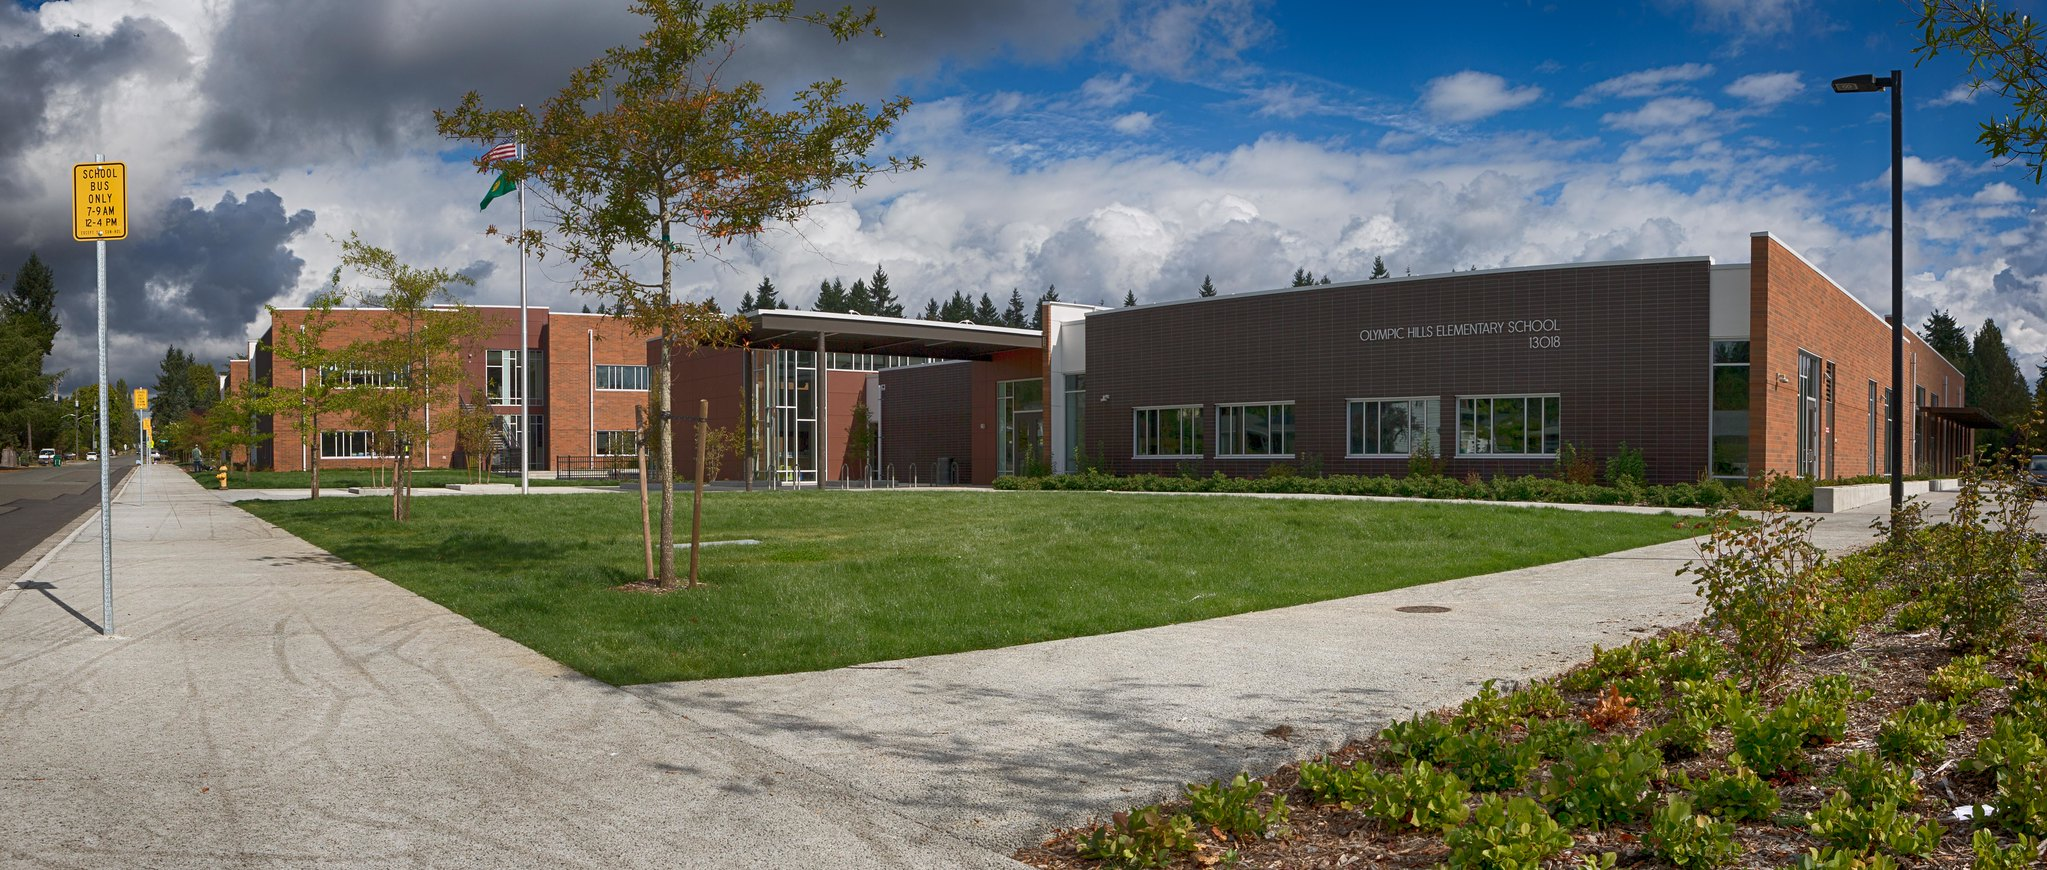 Olympic Hills Elementary School